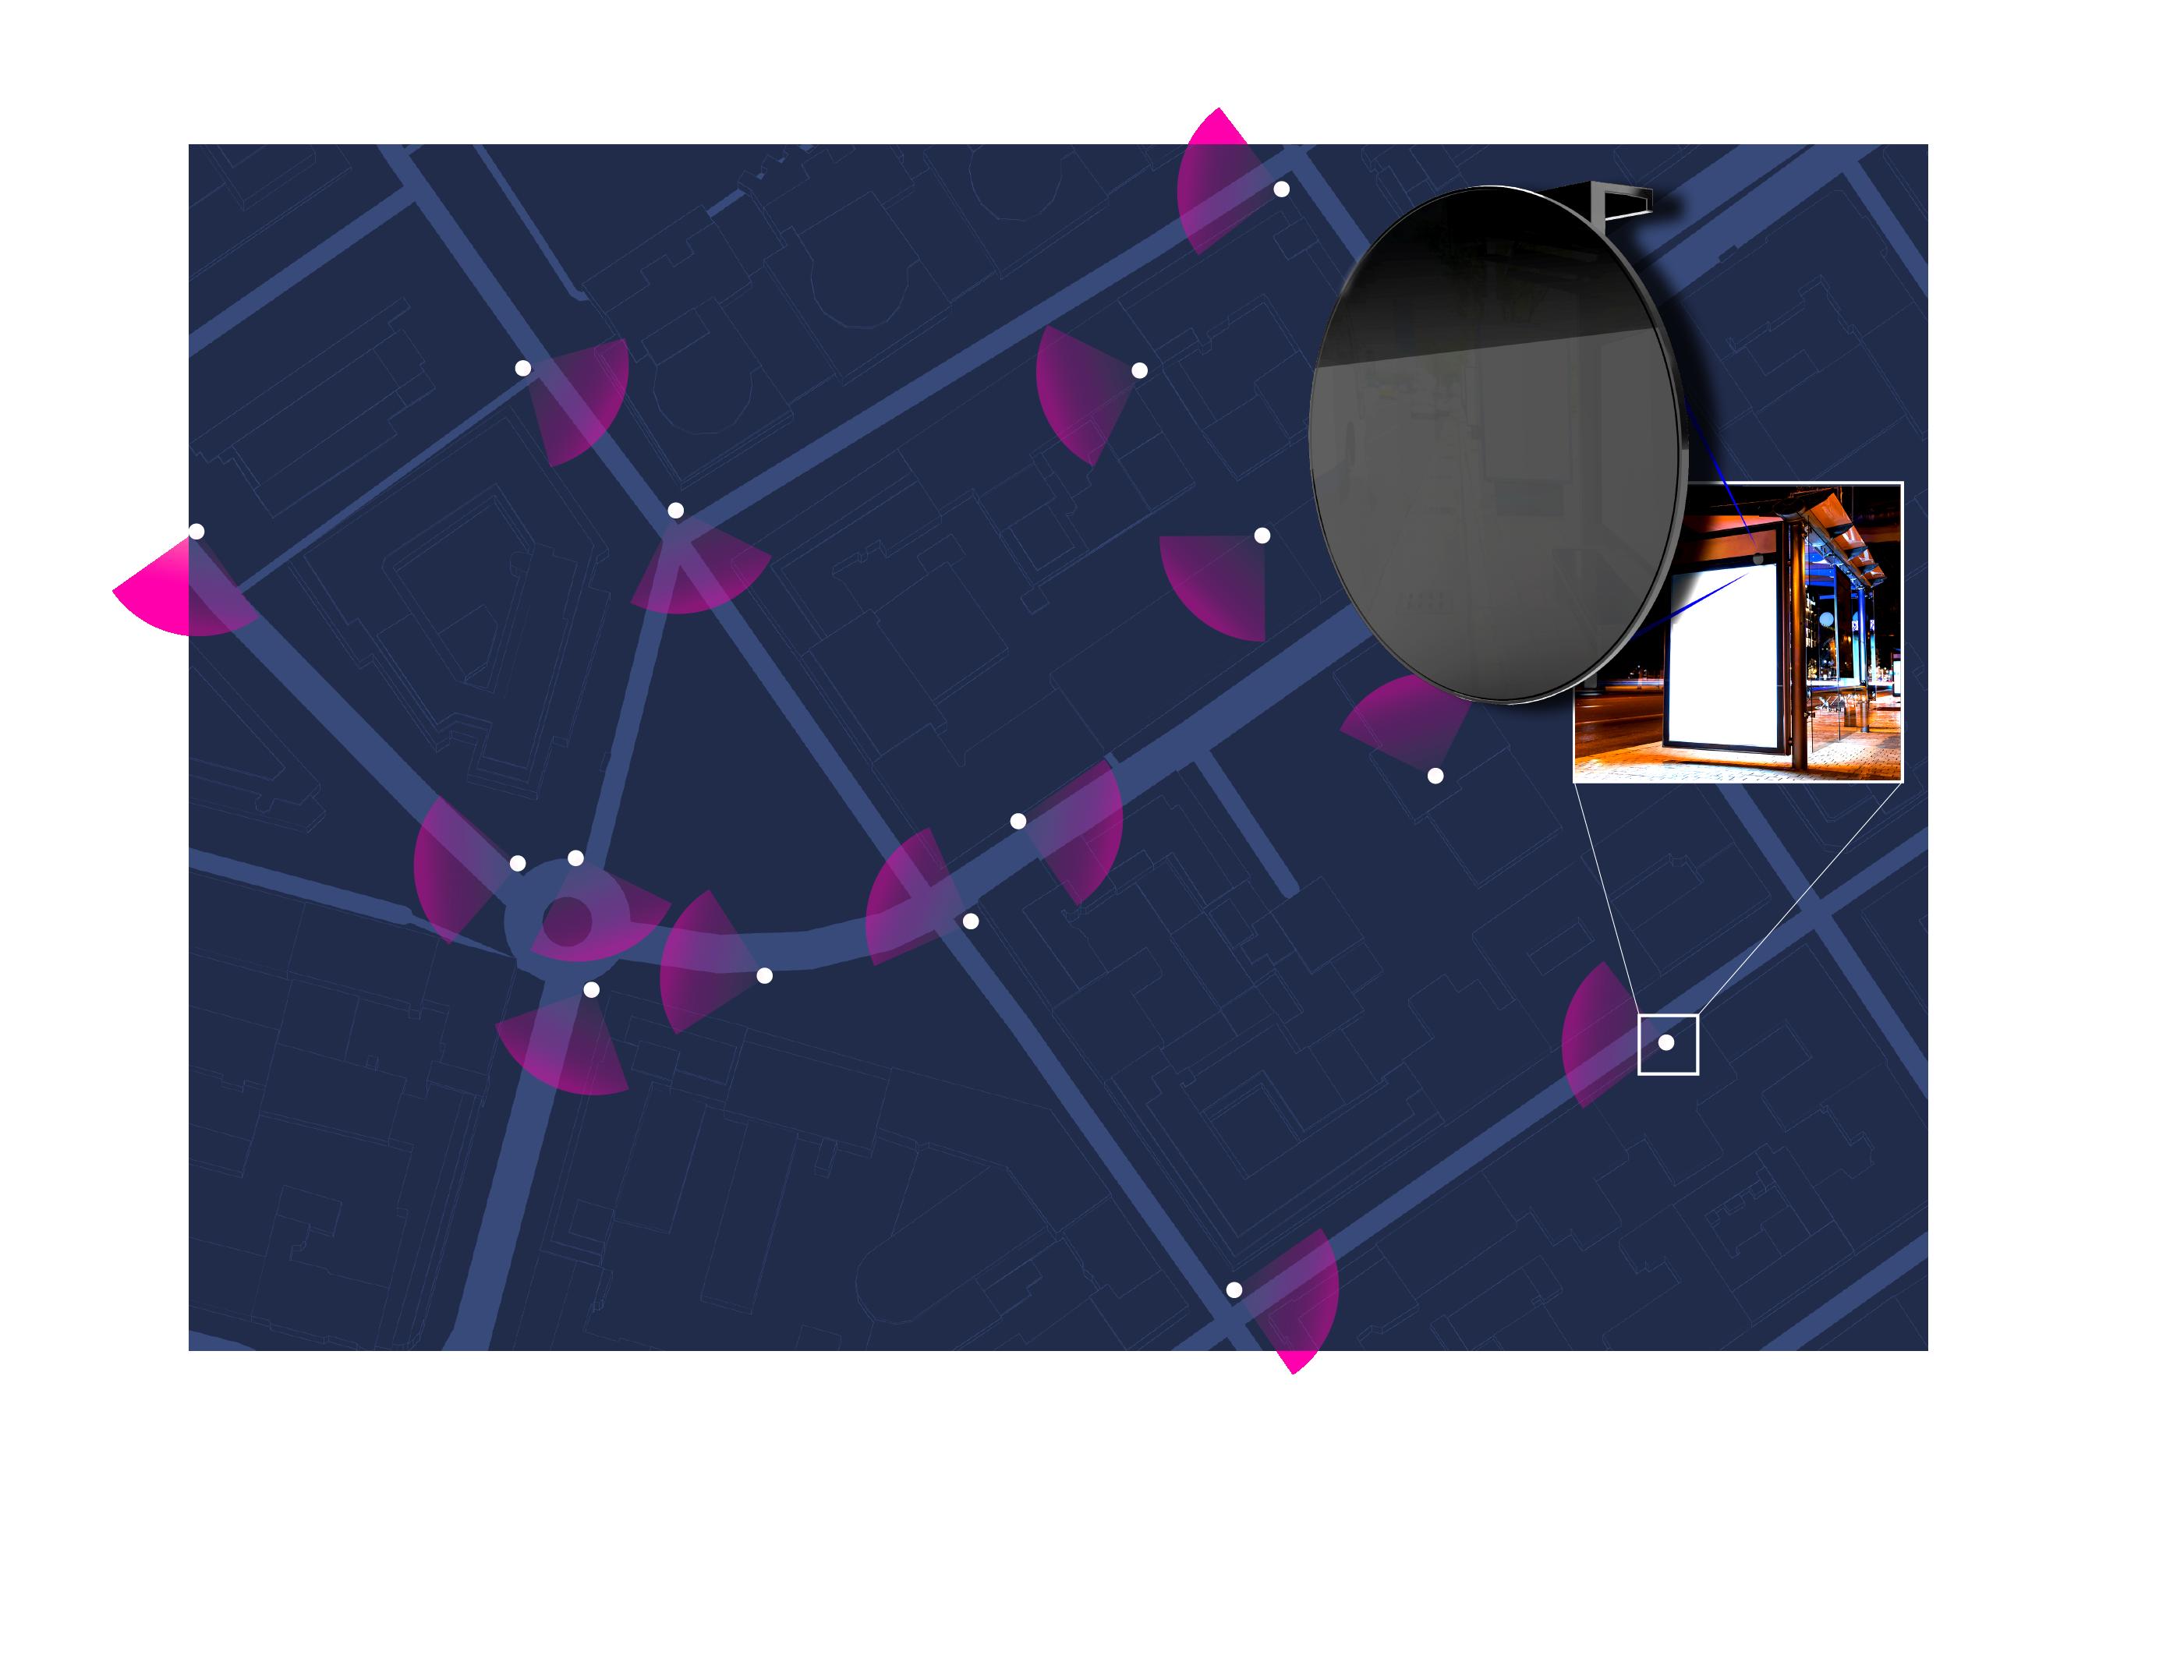 Drakoneye data collecting network